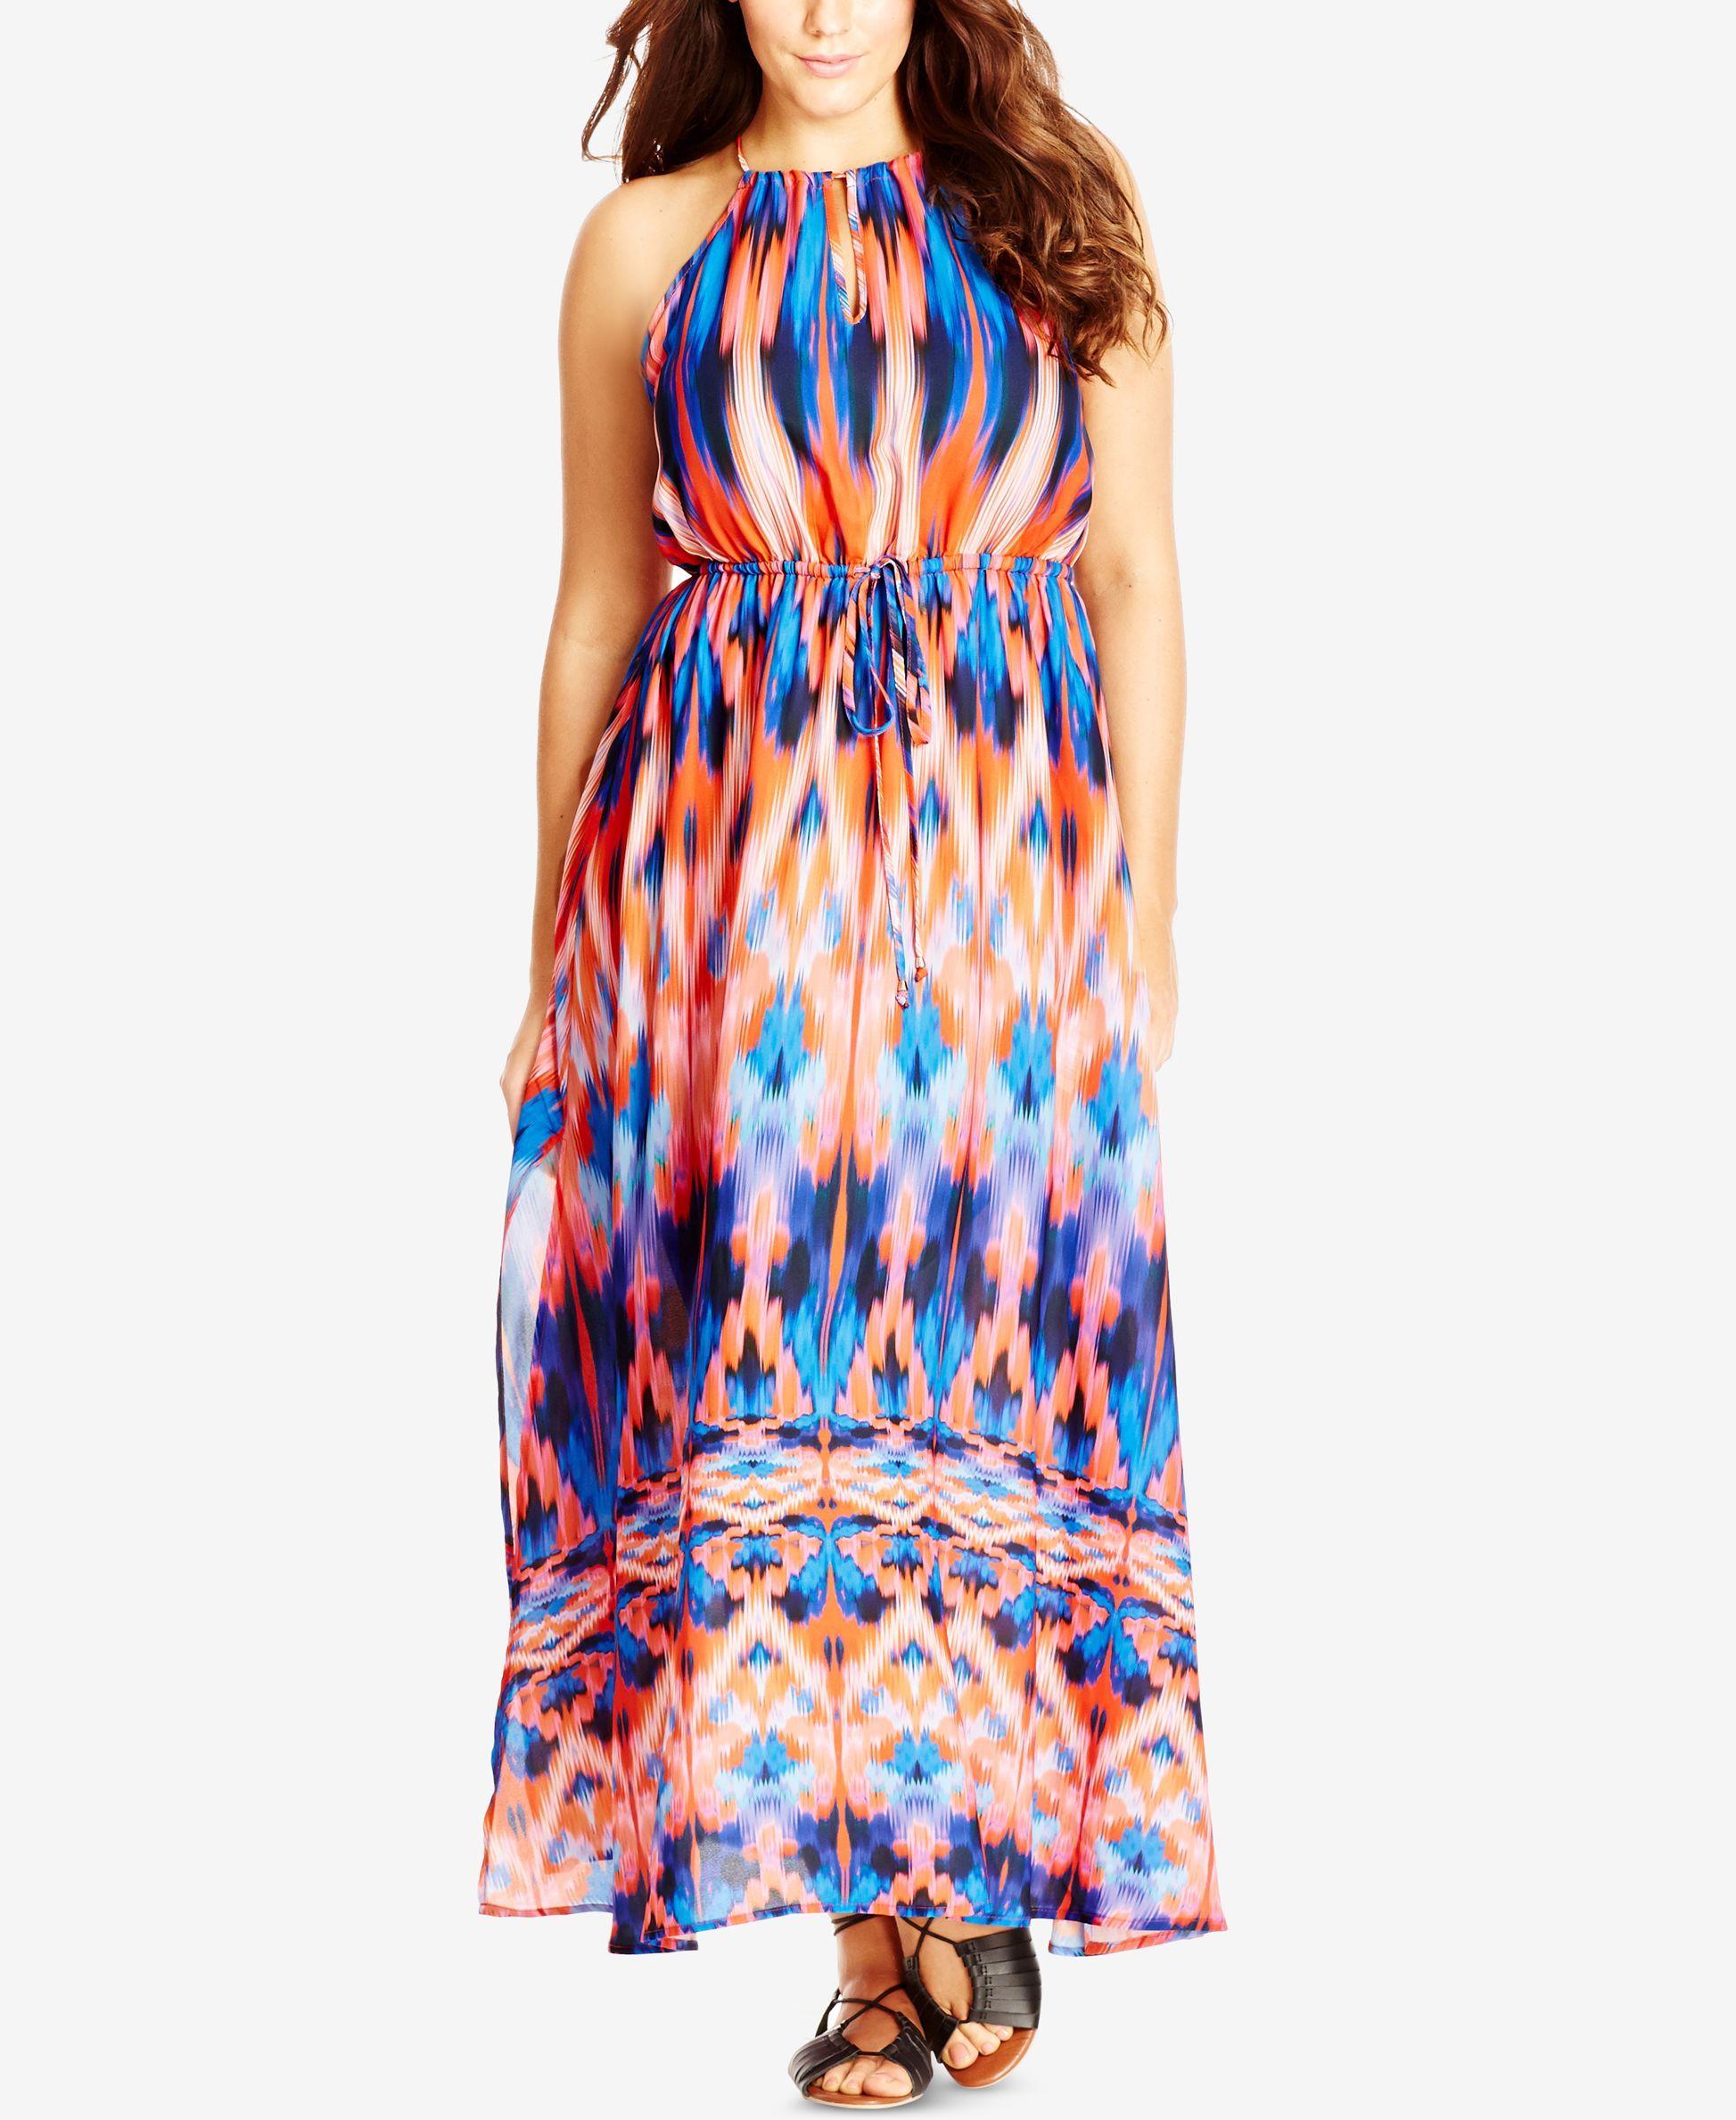 City Chic Plus Size Ikat Print Halter Maxi Dress Dresses Plus Sizes Macy S Tropical Maxi Dress Maxi Dress Style Maxi Dress [ 2378 x 1947 Pixel ]